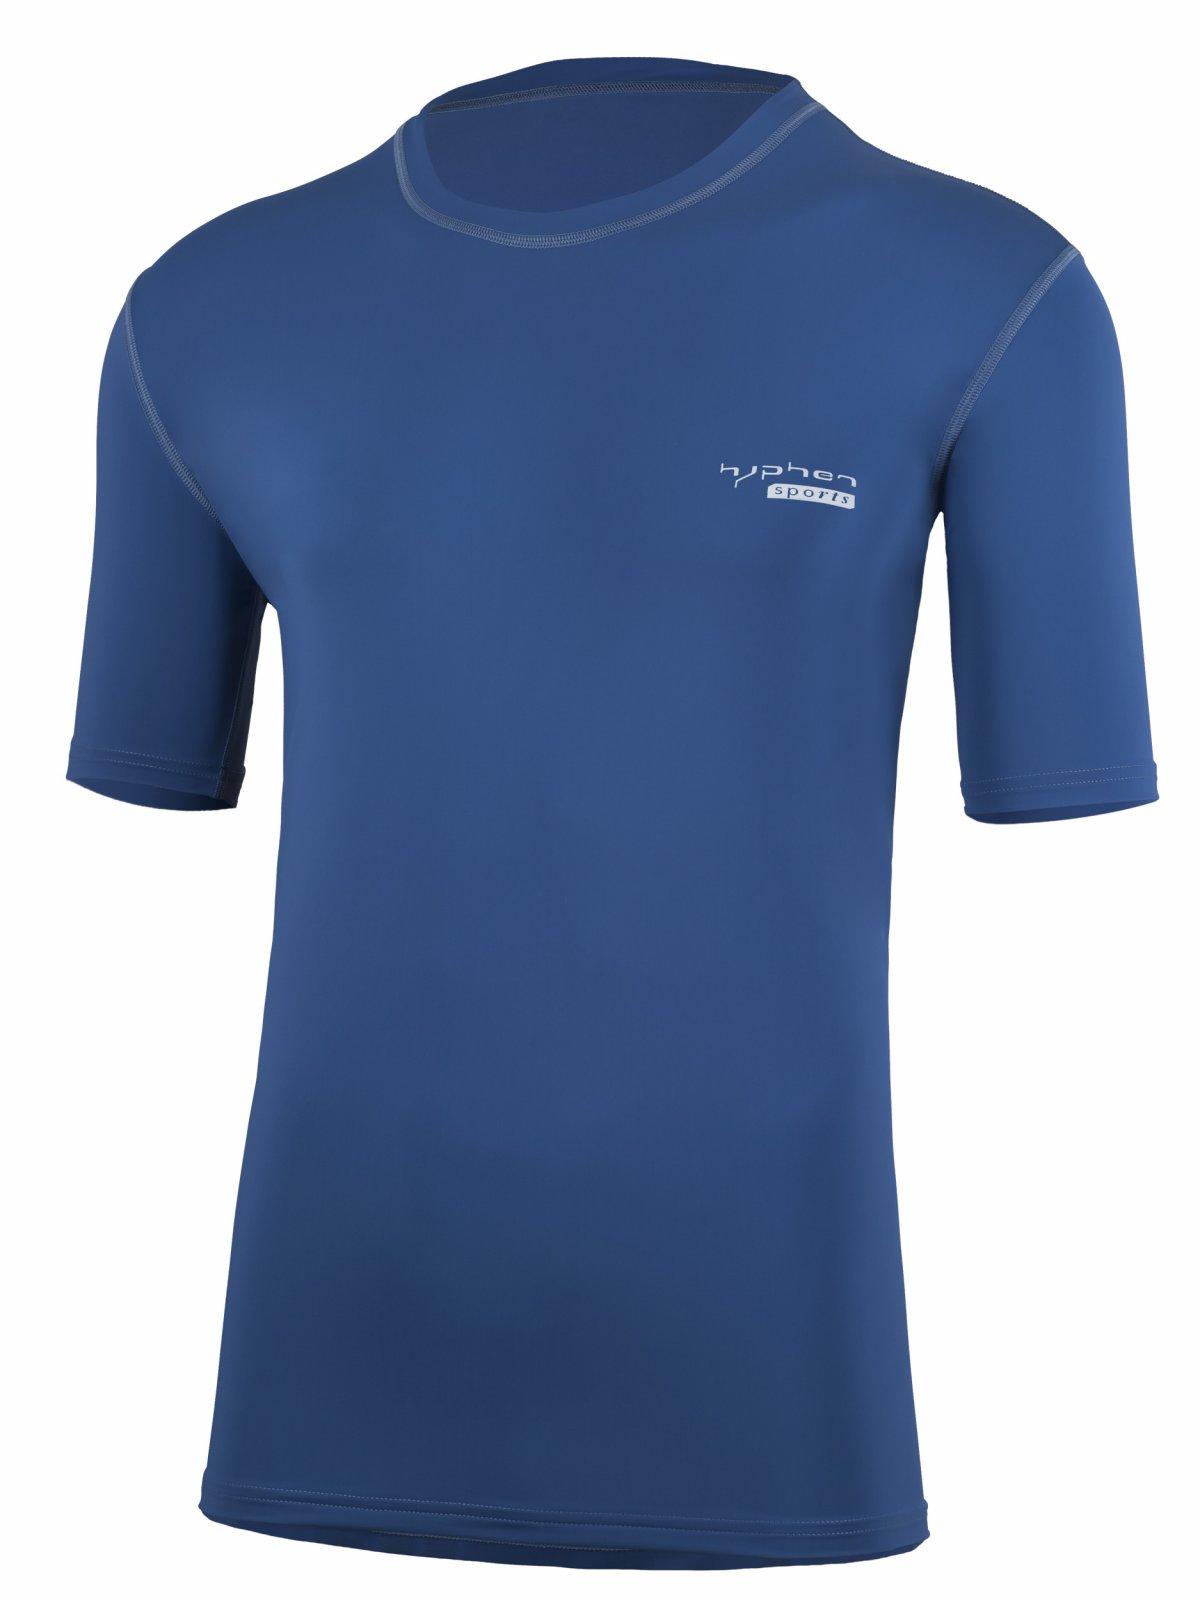 UV skjorte for voksne.UPF 80+